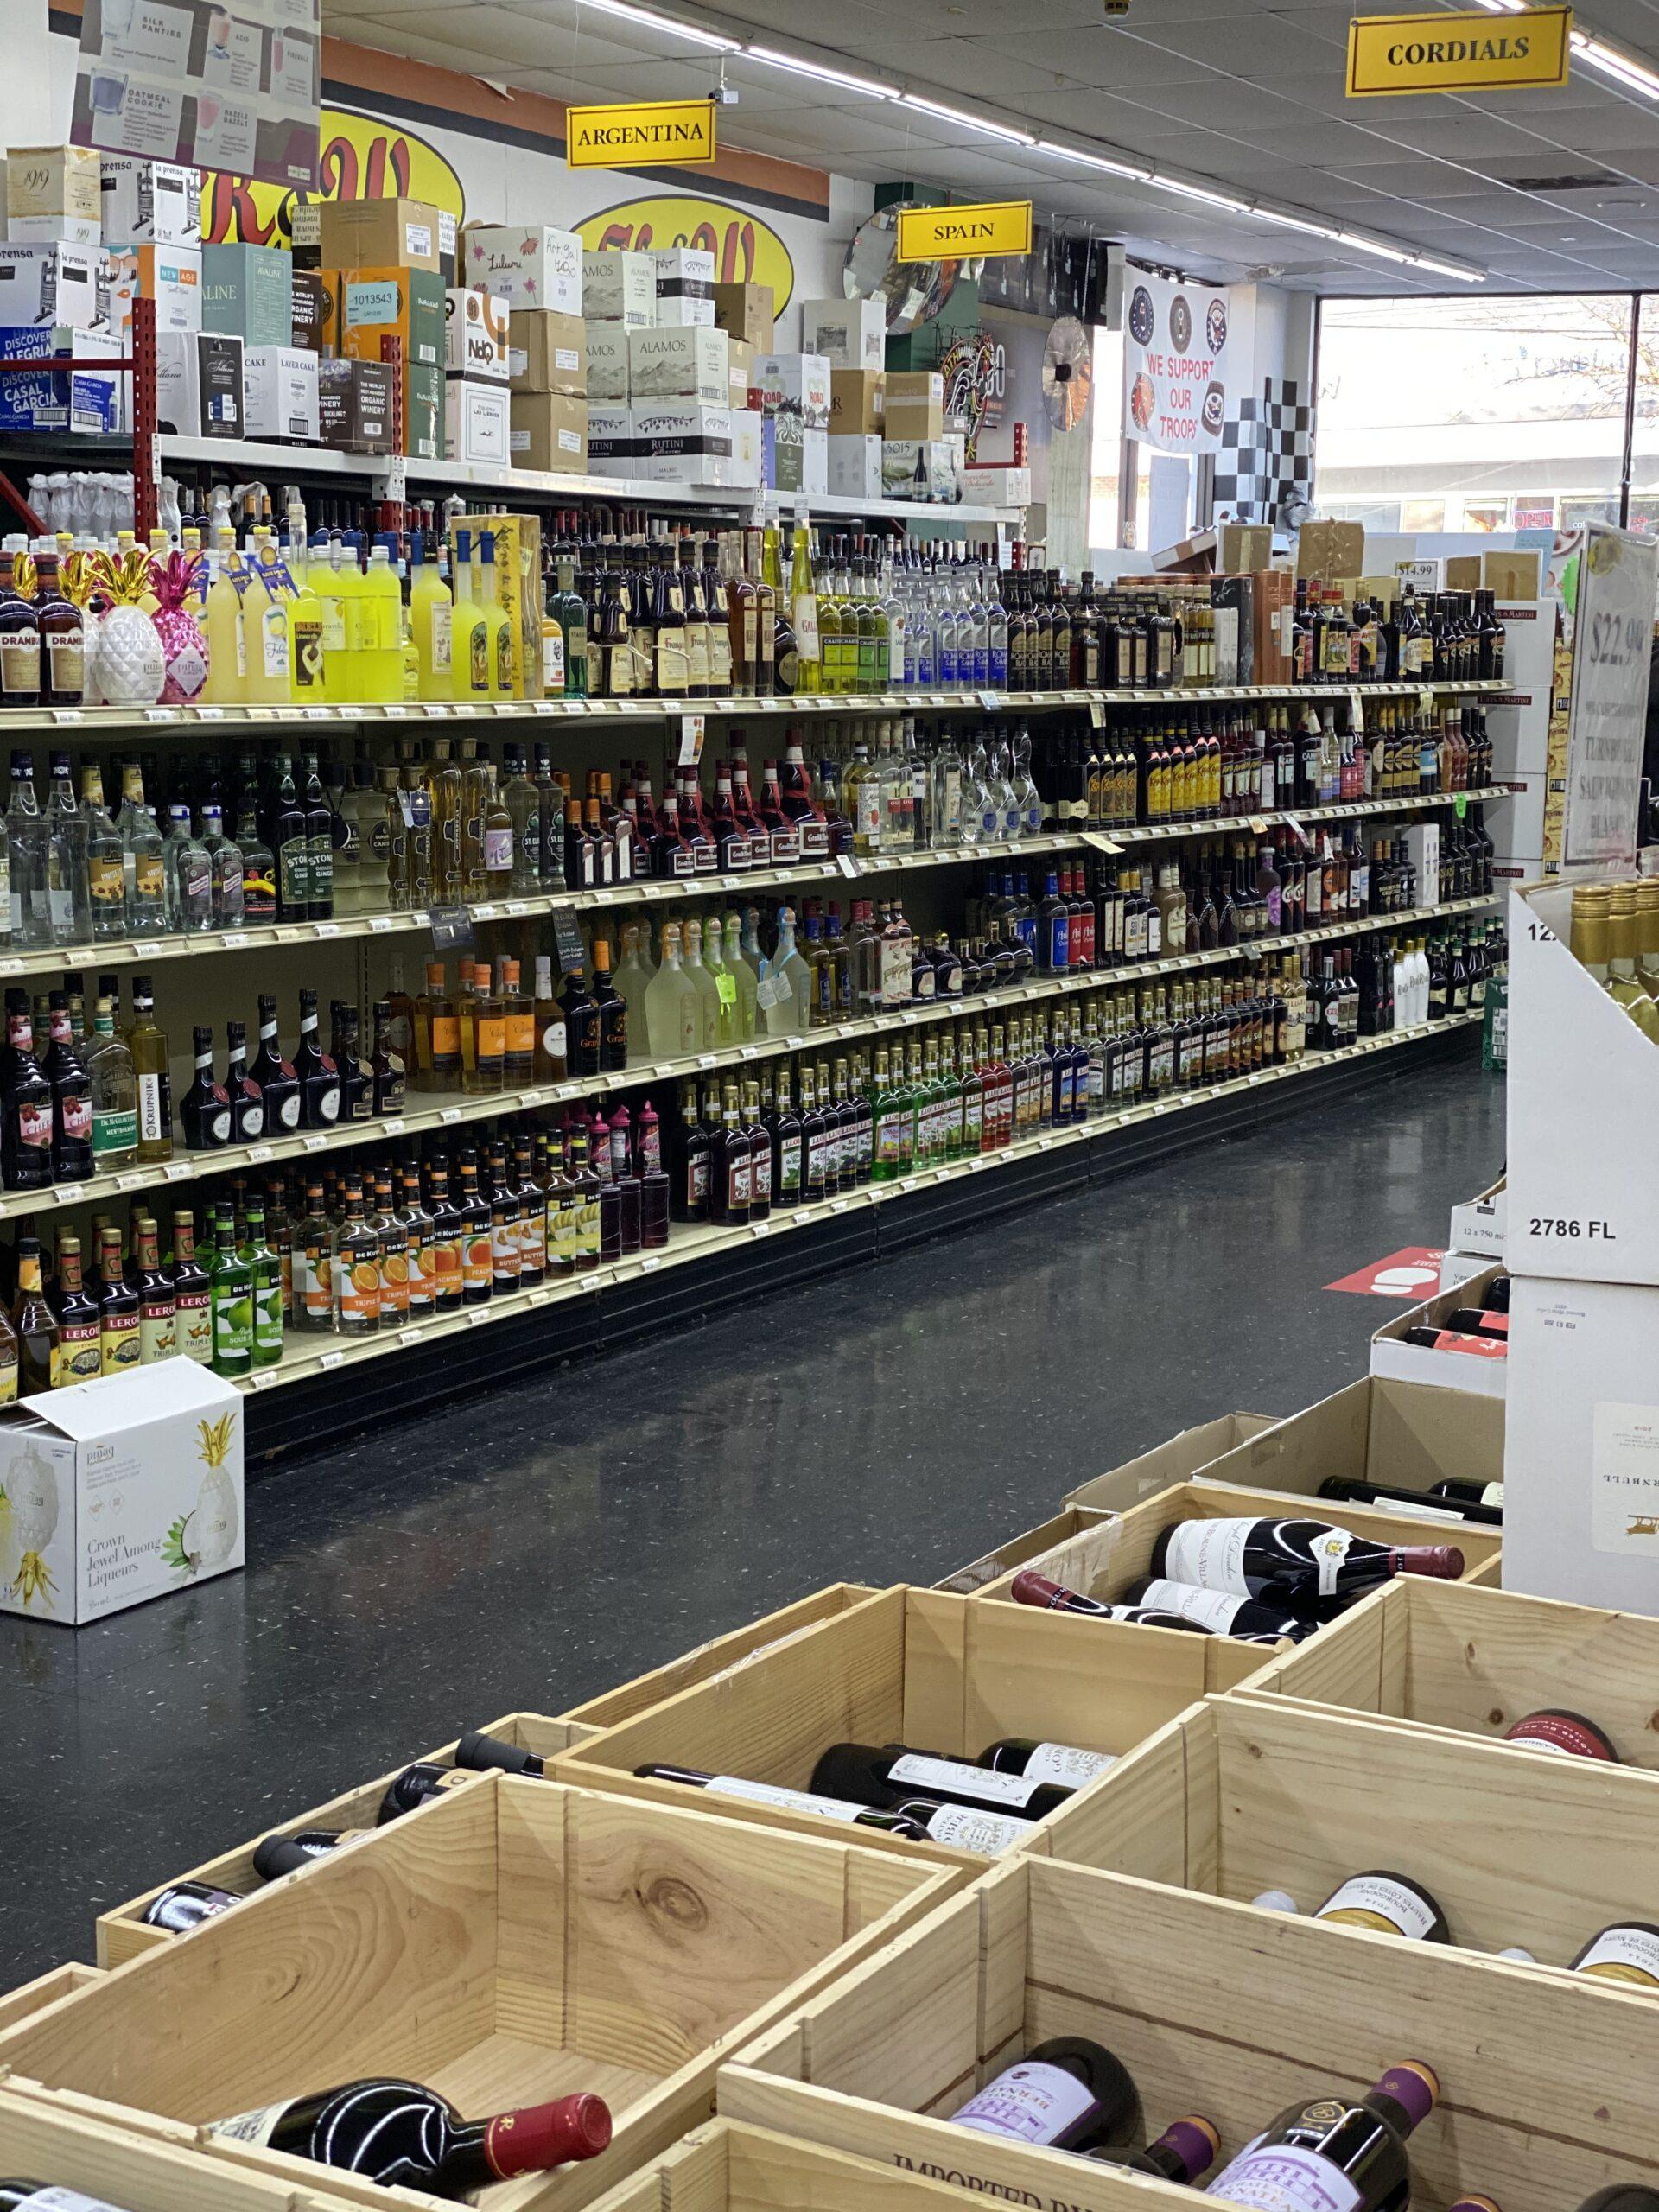 K&W Liquors, Franklin Square